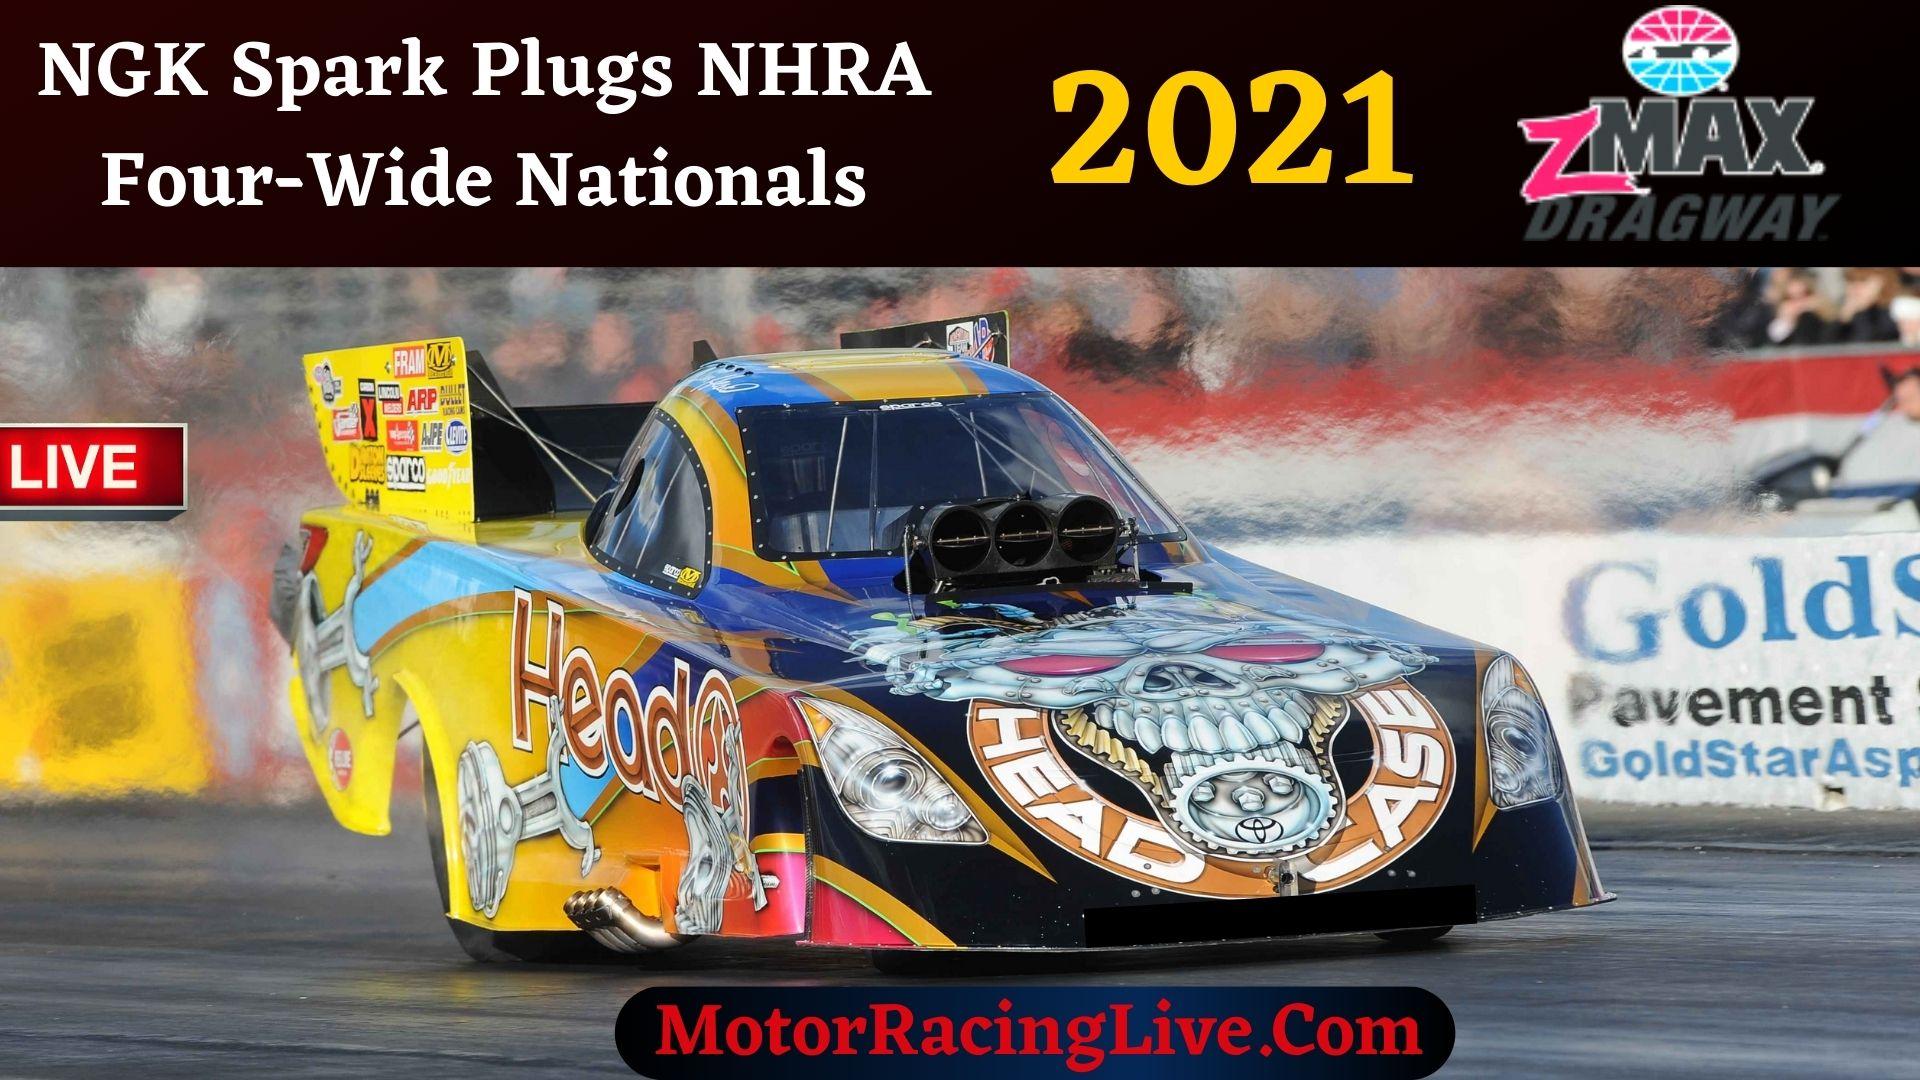 NGK Spark Plugs NHRA Four-Wide Nationals 2021 Live Stream